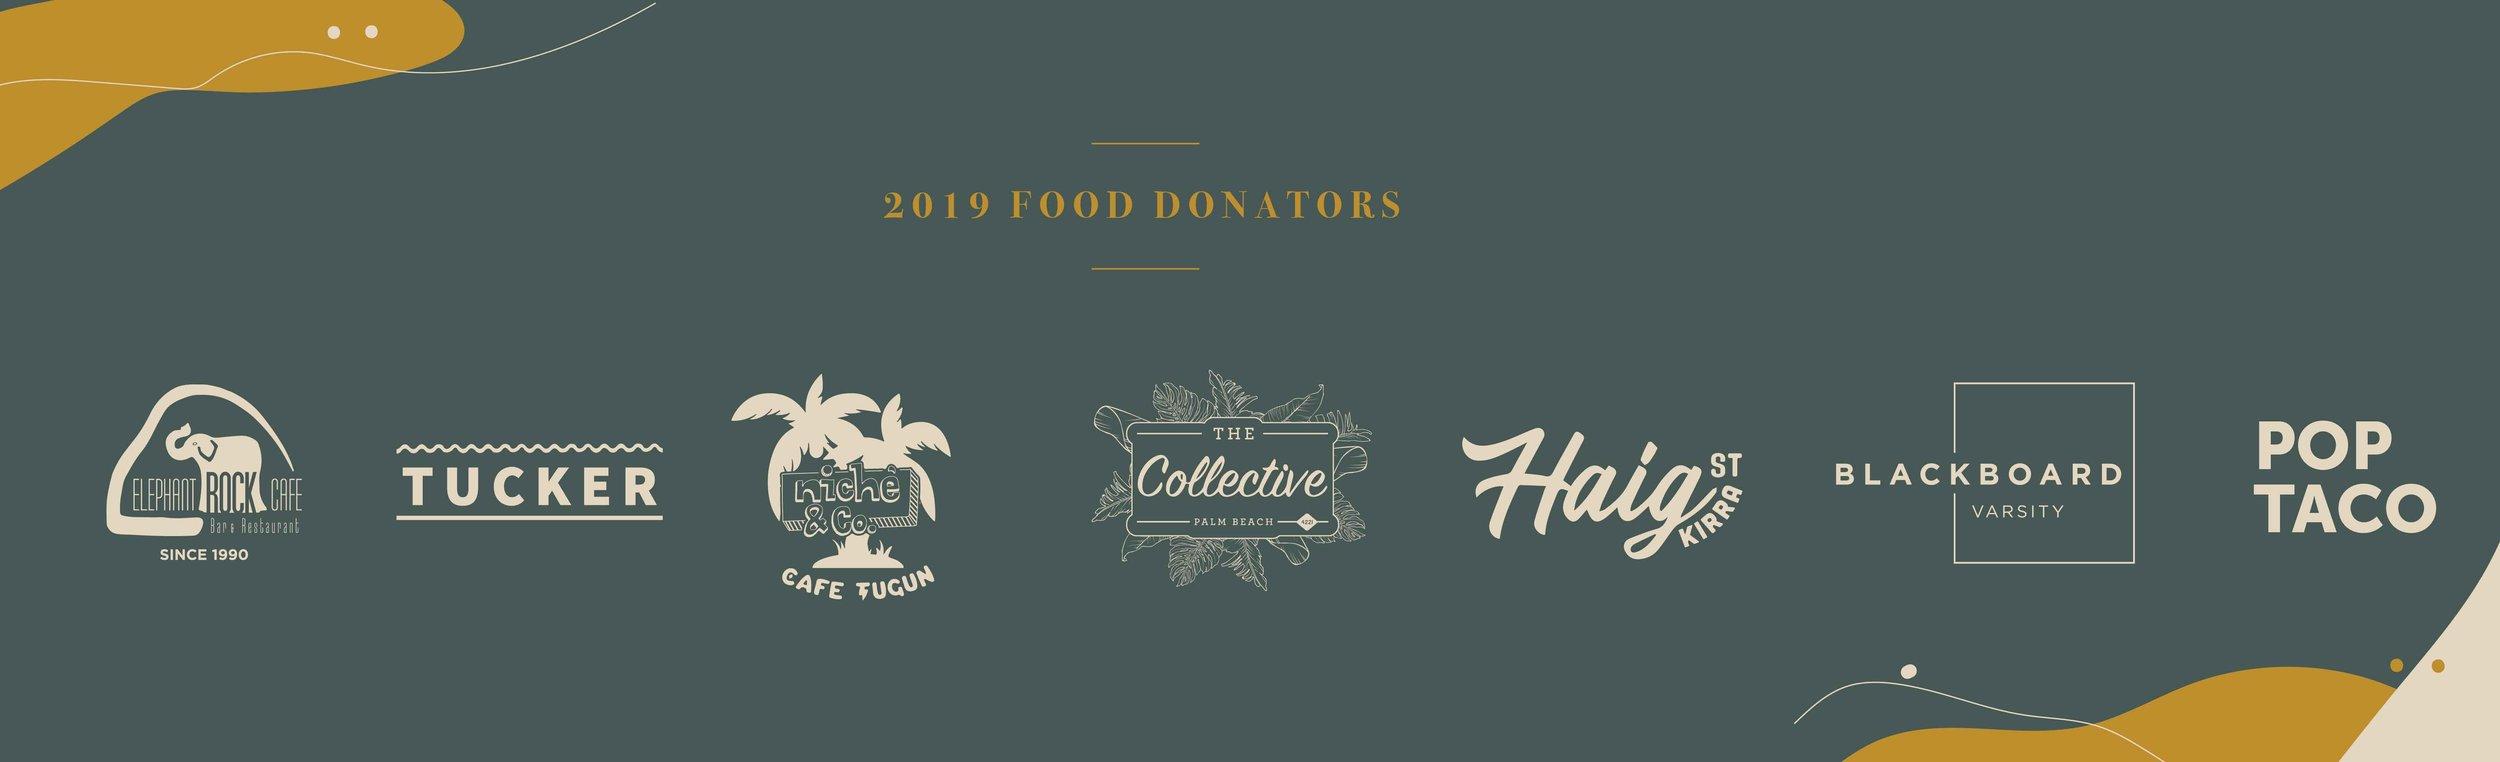 Food Donators_2019-08.jpg